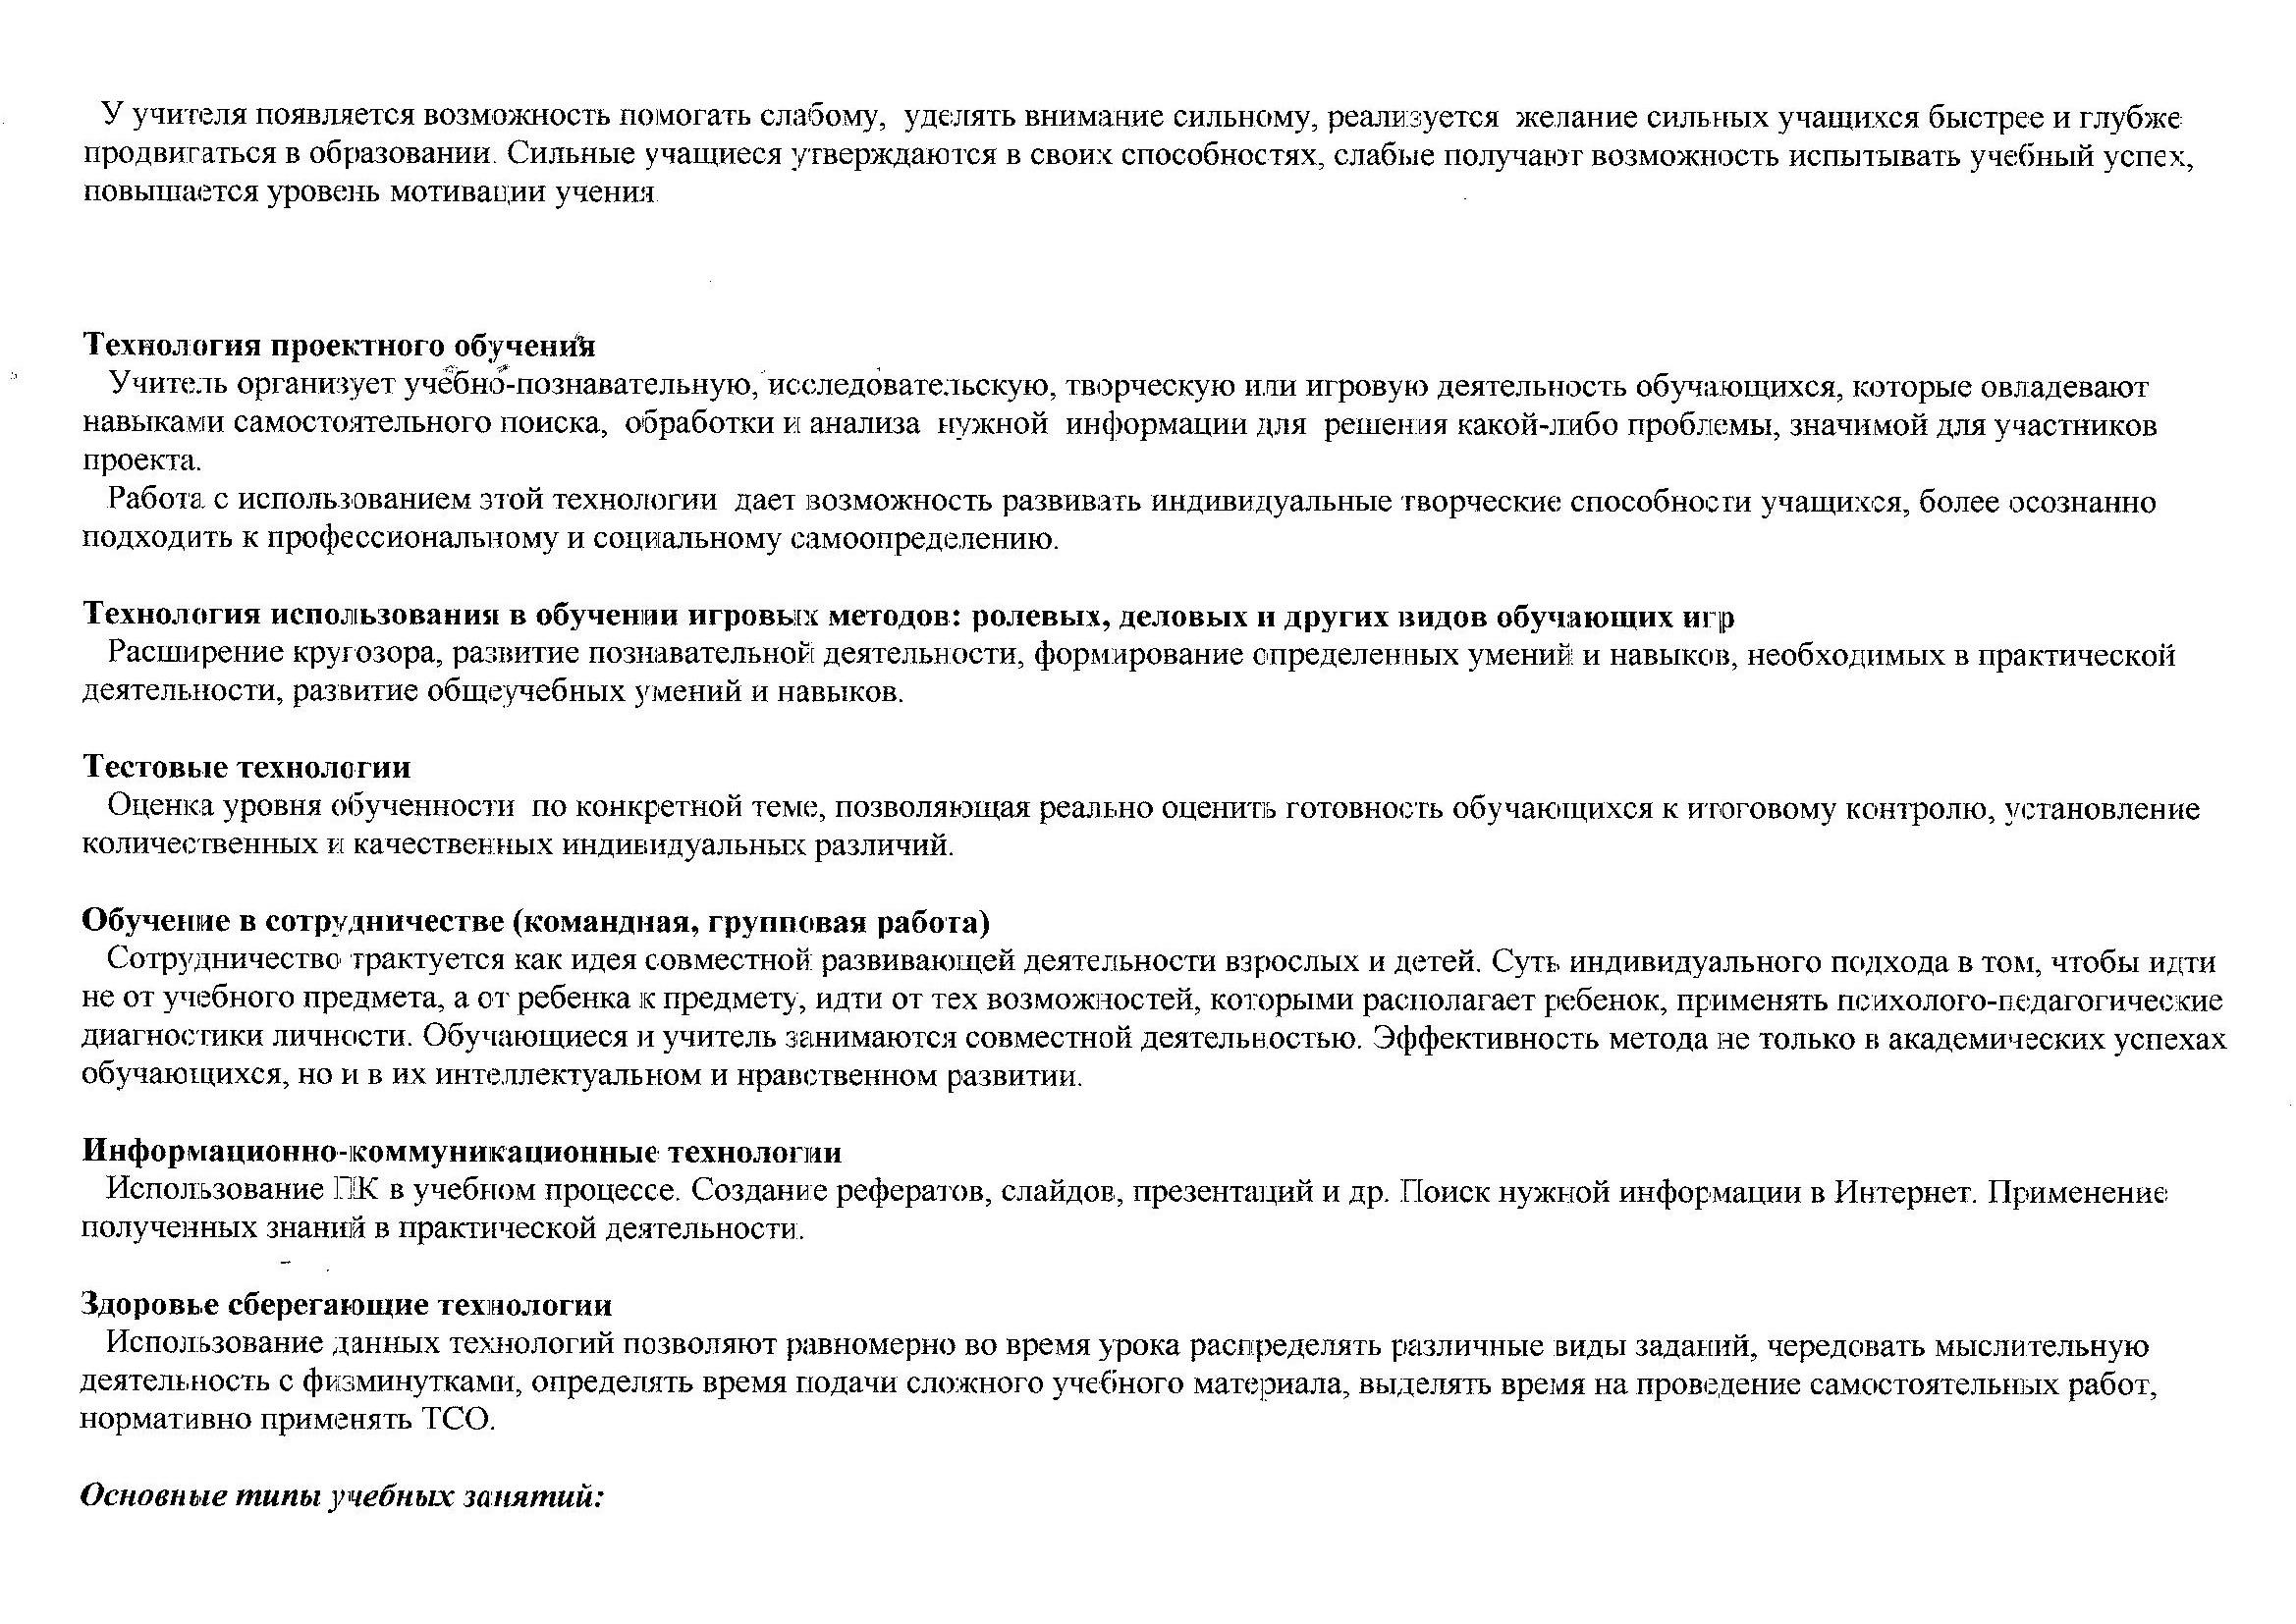 C:\Users\бакс\Documents\Scan0004.jpg